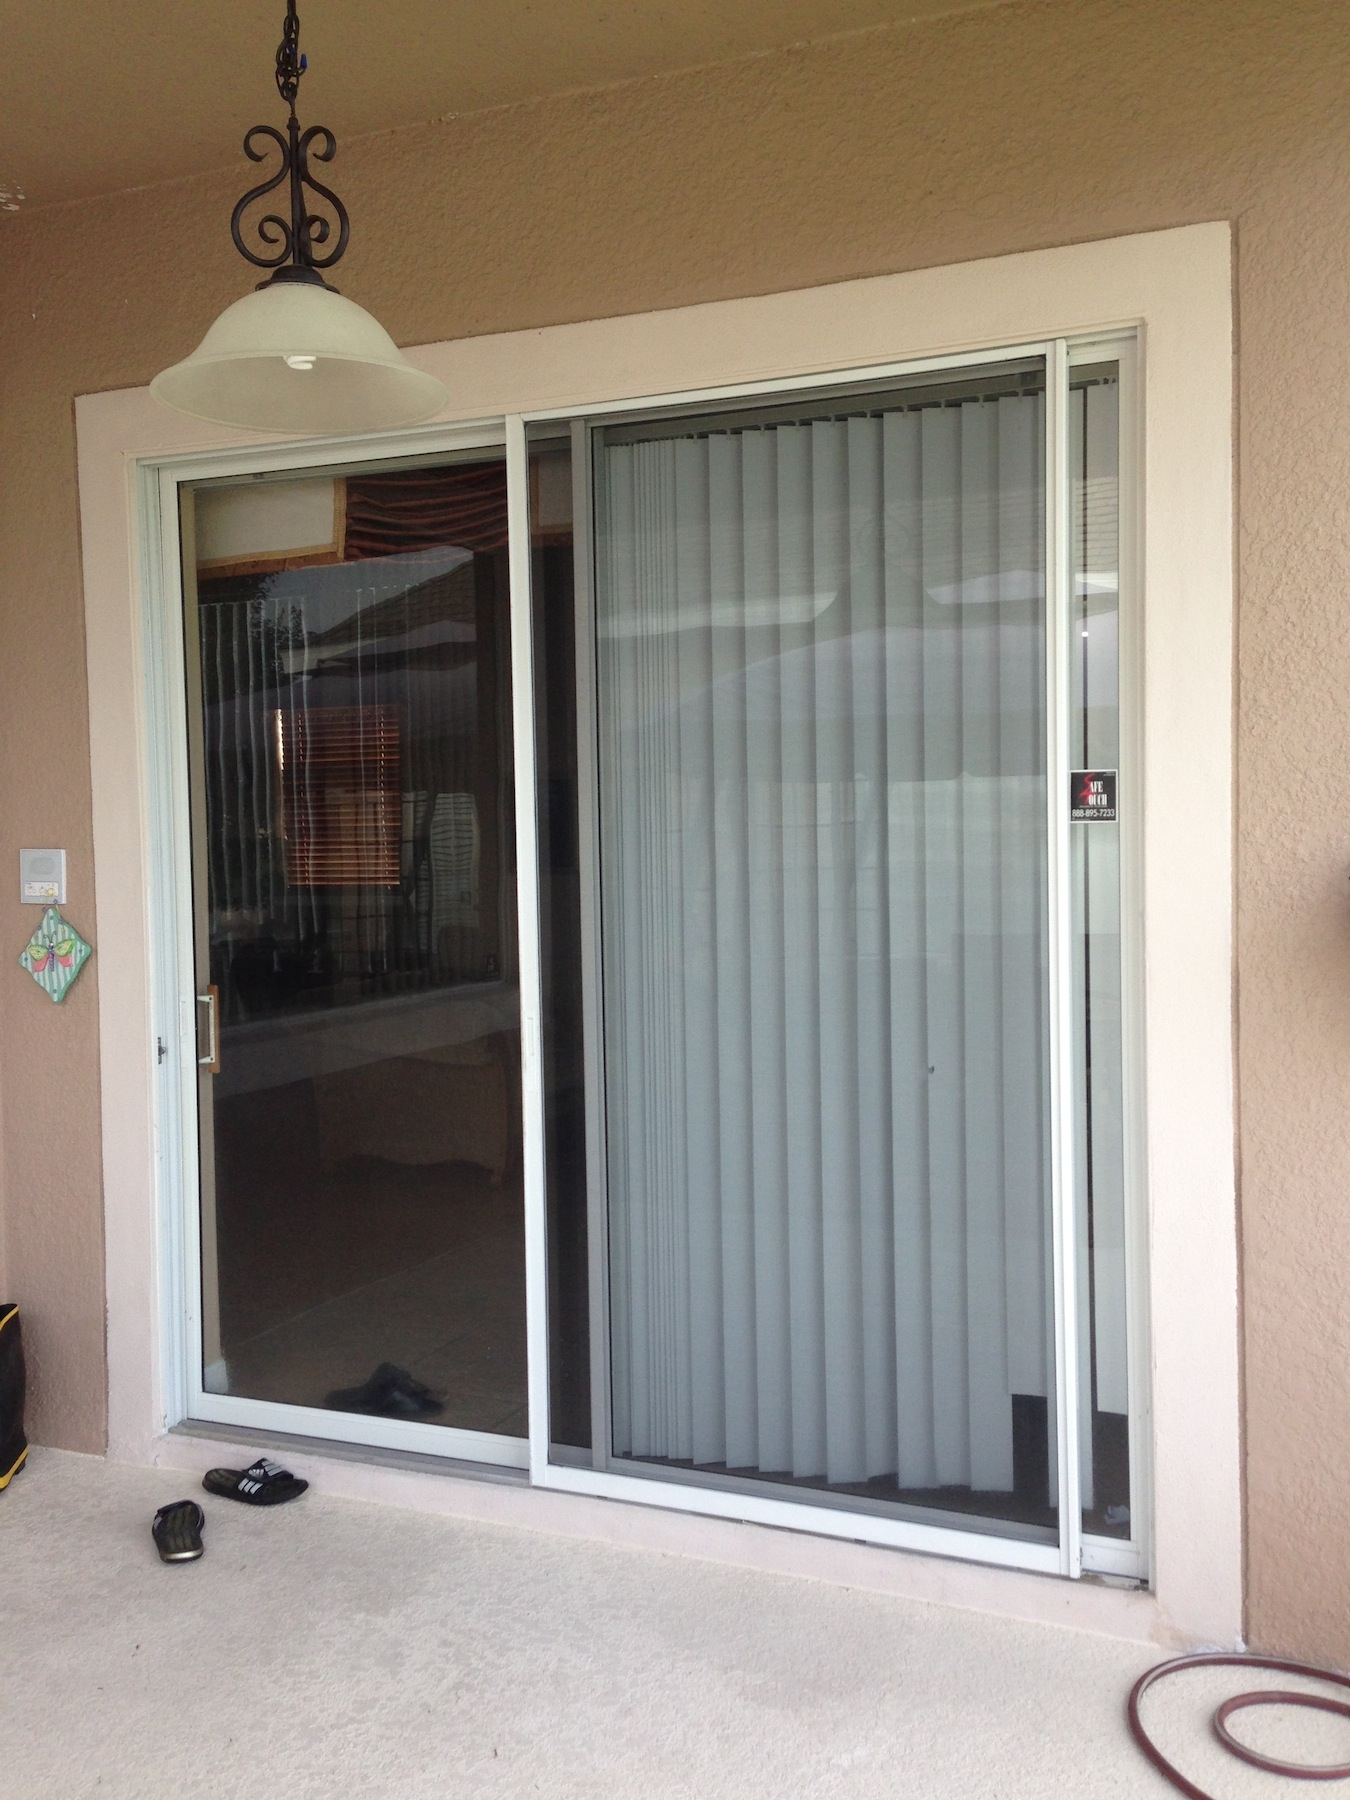 Marvelous Security Window Film For Sliding Glass Doors1350 X 1800